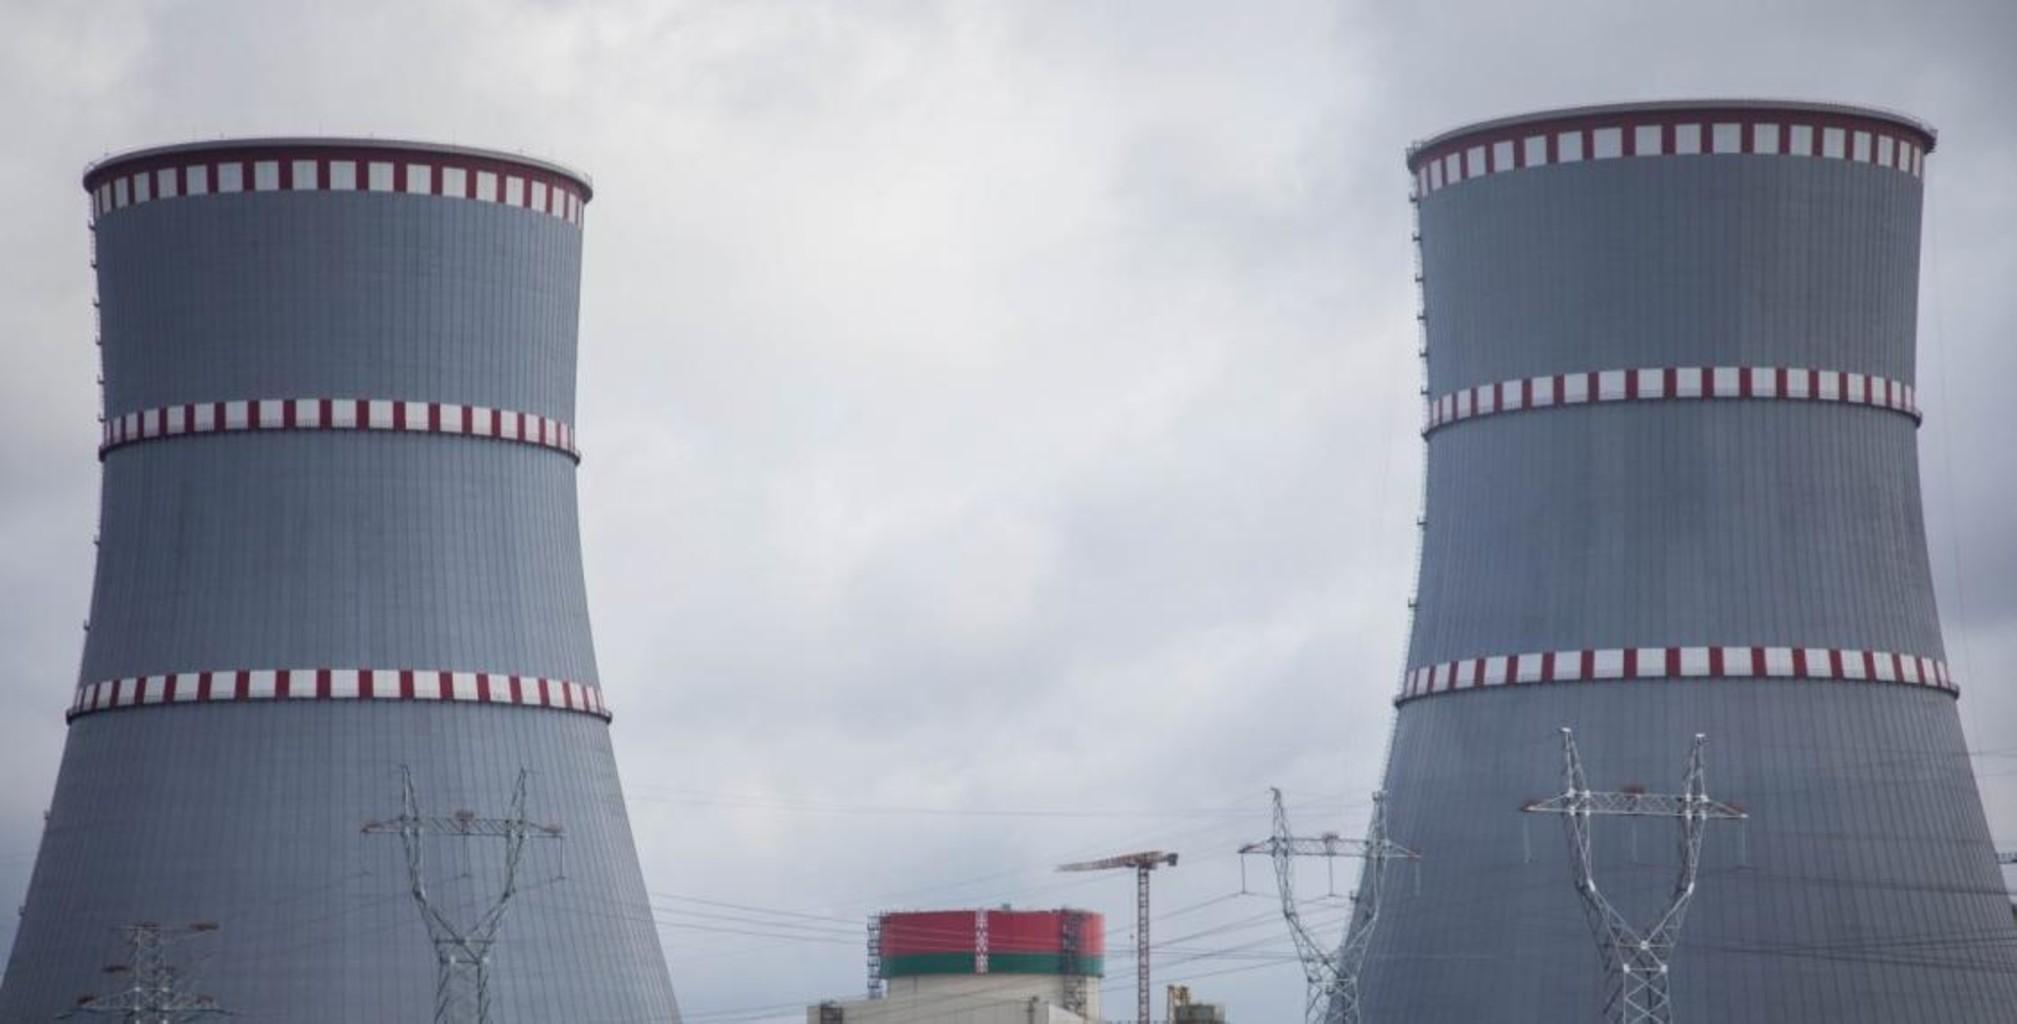 Astravo atomine elektrine 82490027